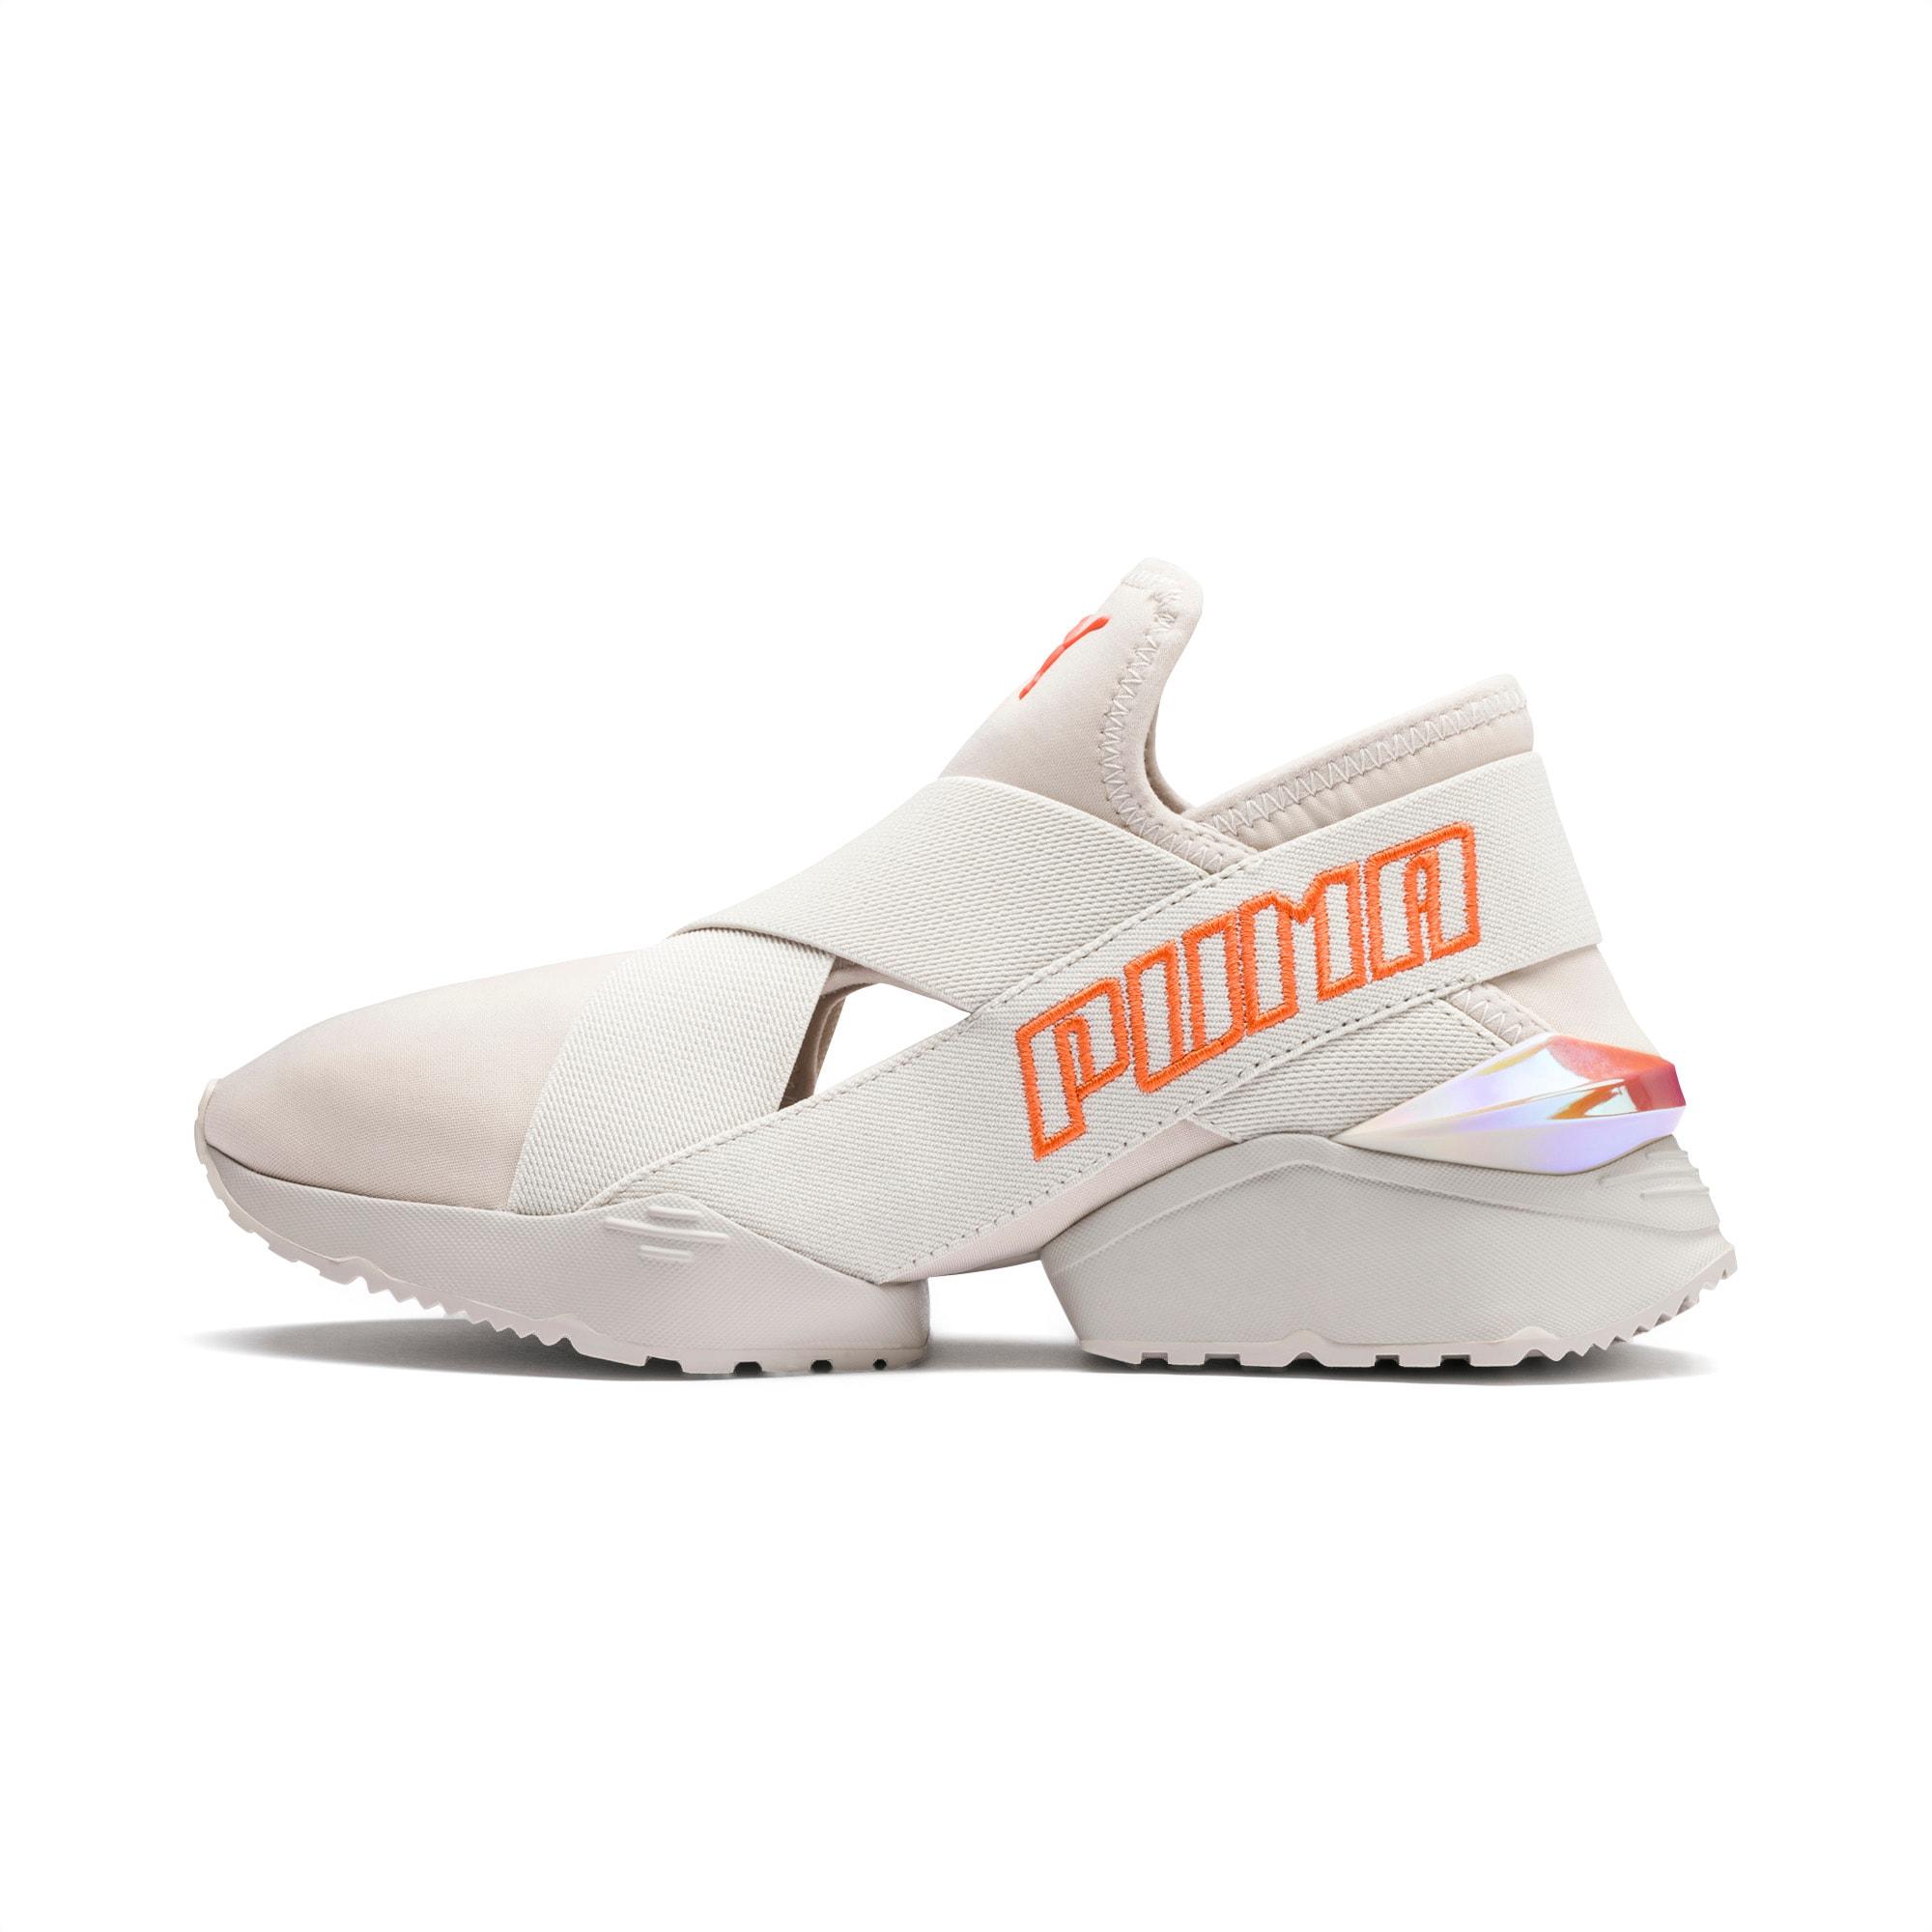 Muse EOS 2 Trailblazer Metallic Women's Sneakers